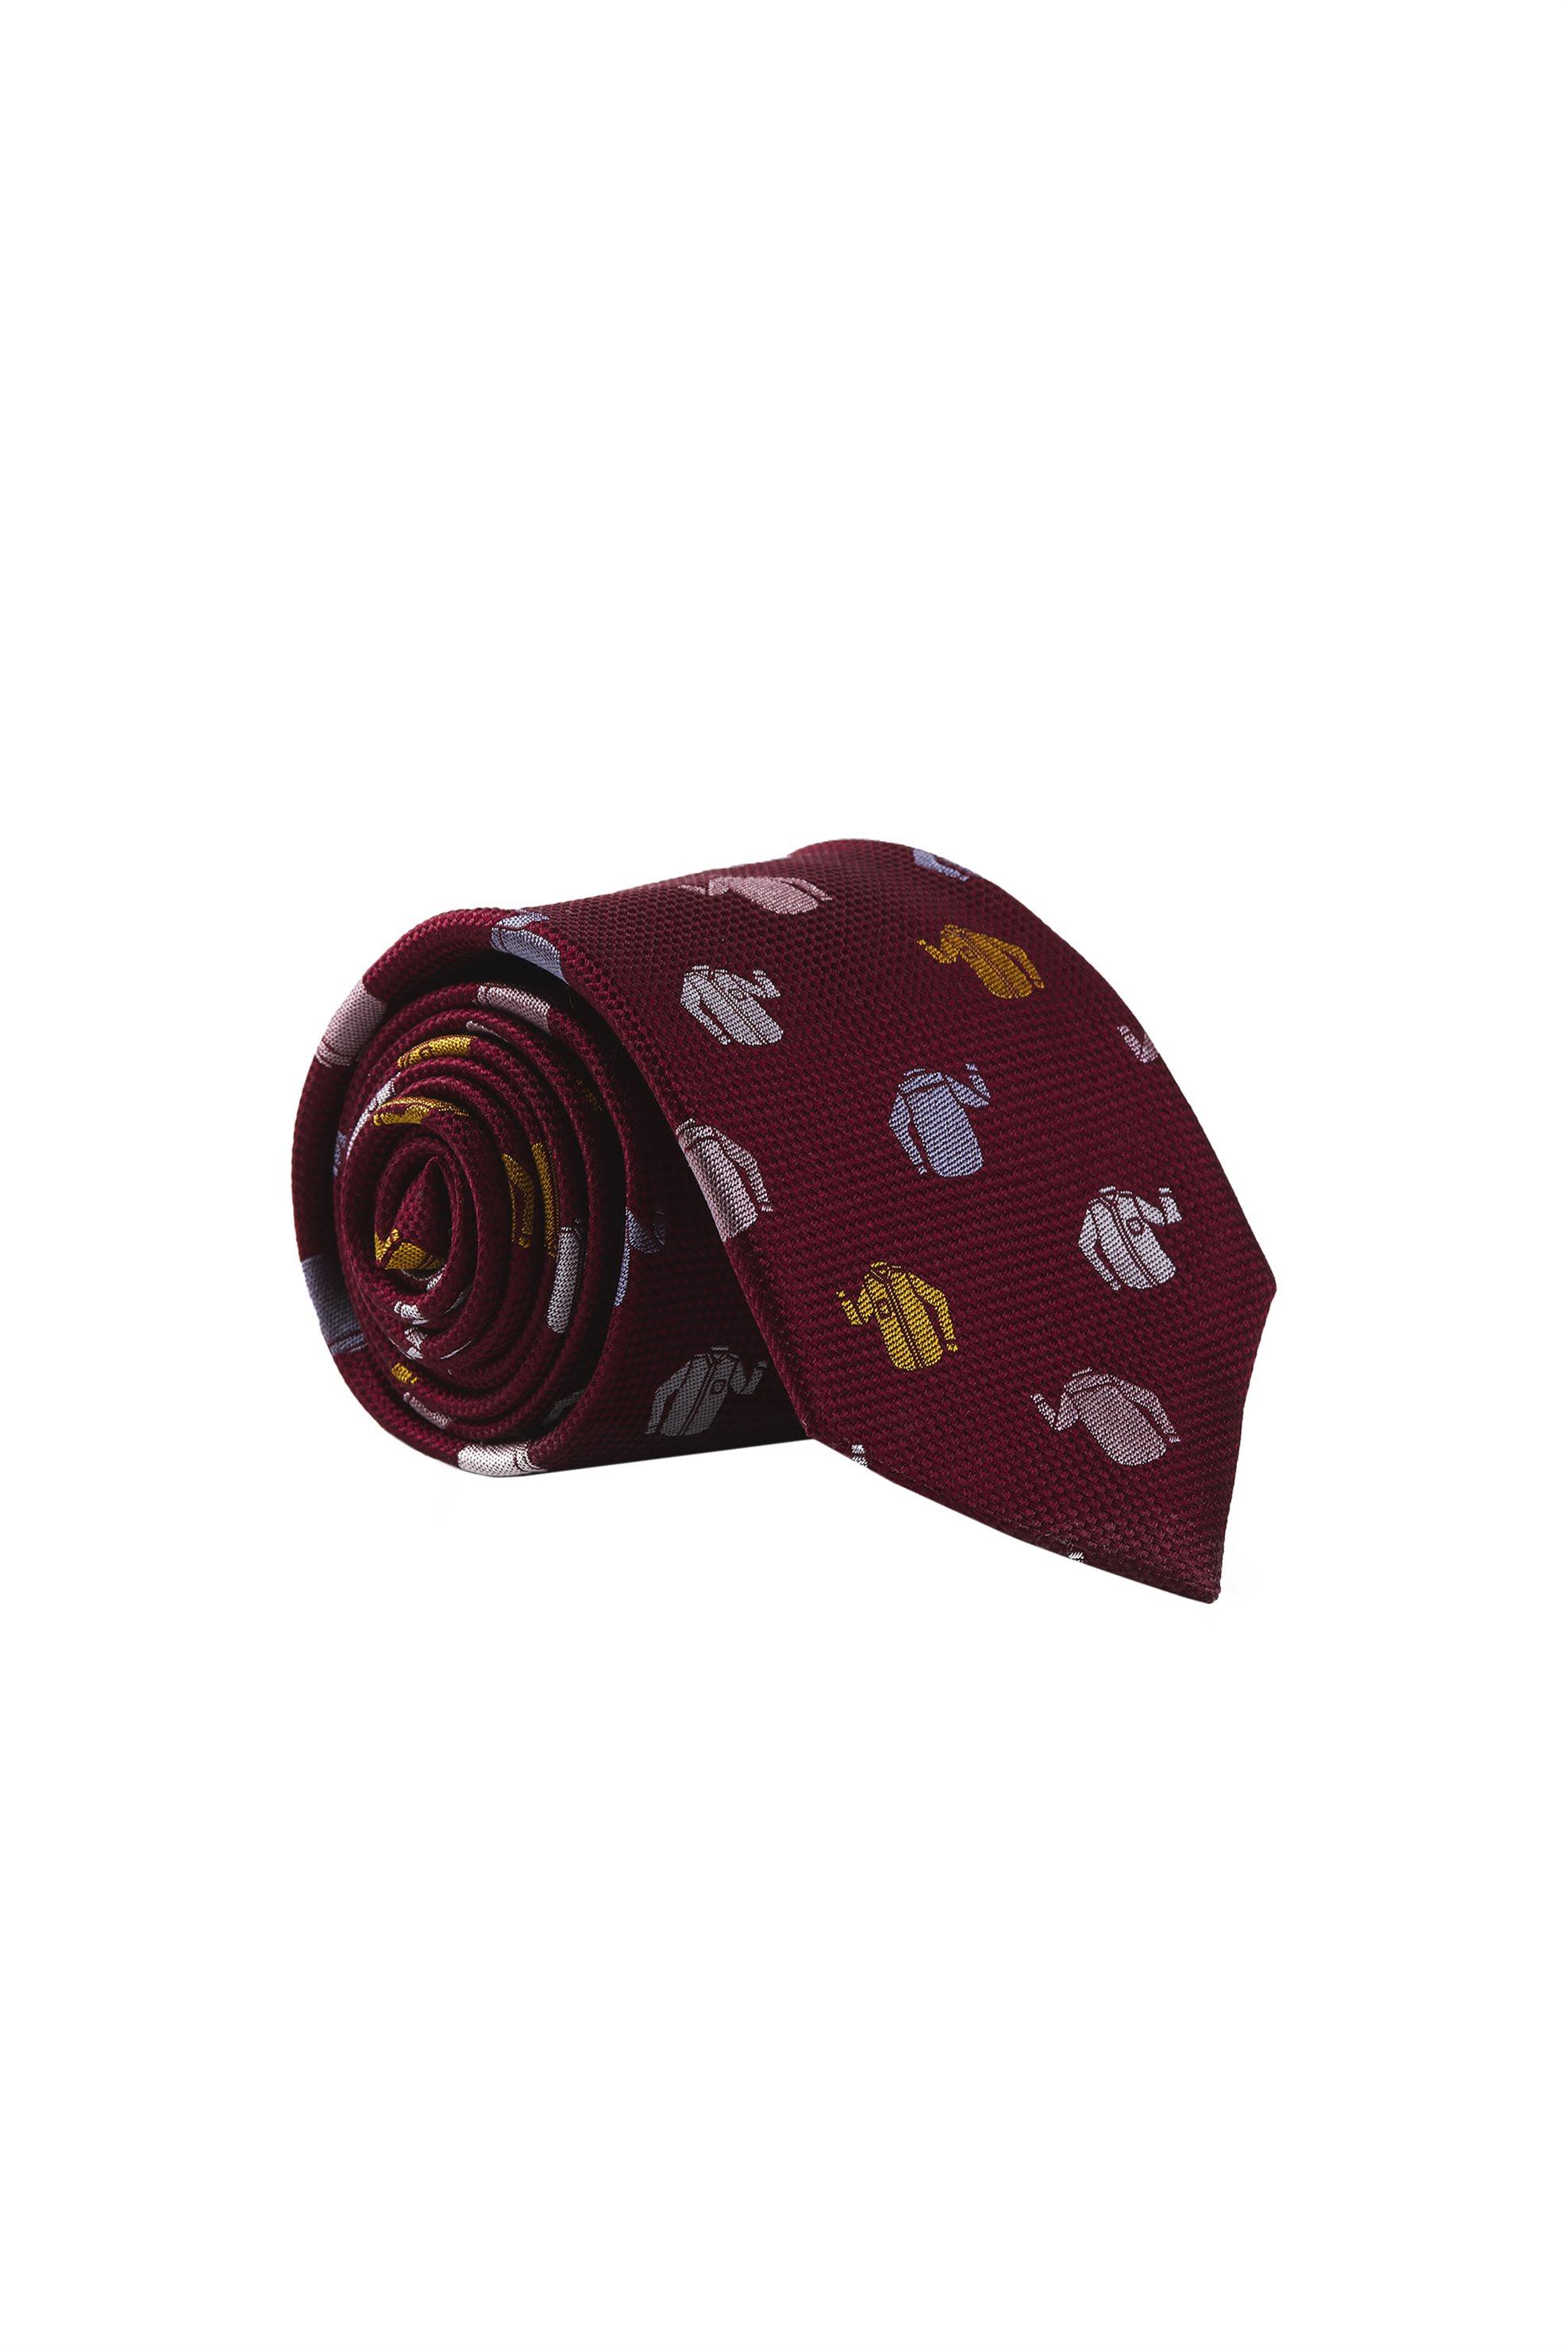 Gant ανδρική μεταξωτή γραβάτα με print - 9950089 - Κεραμιδί